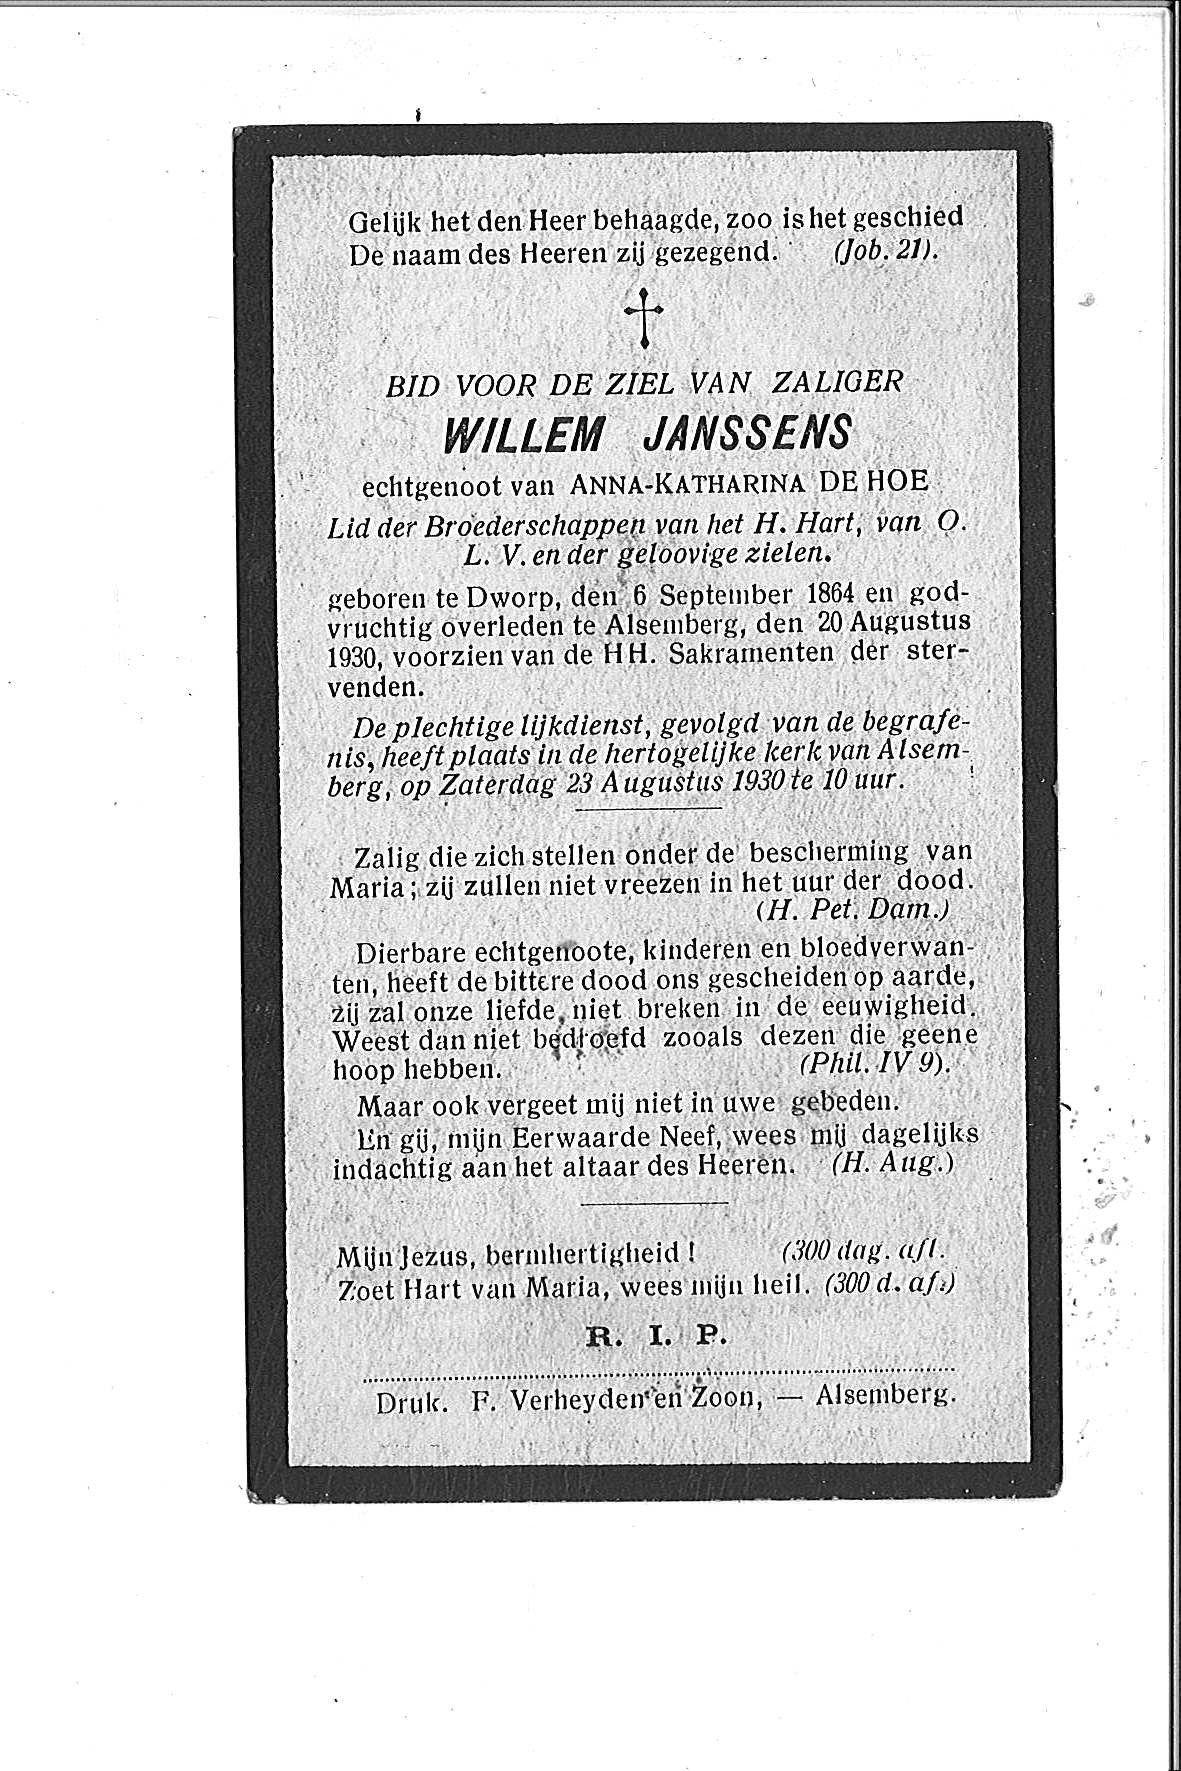 Willem(1930)20150518091009_00027.jpg